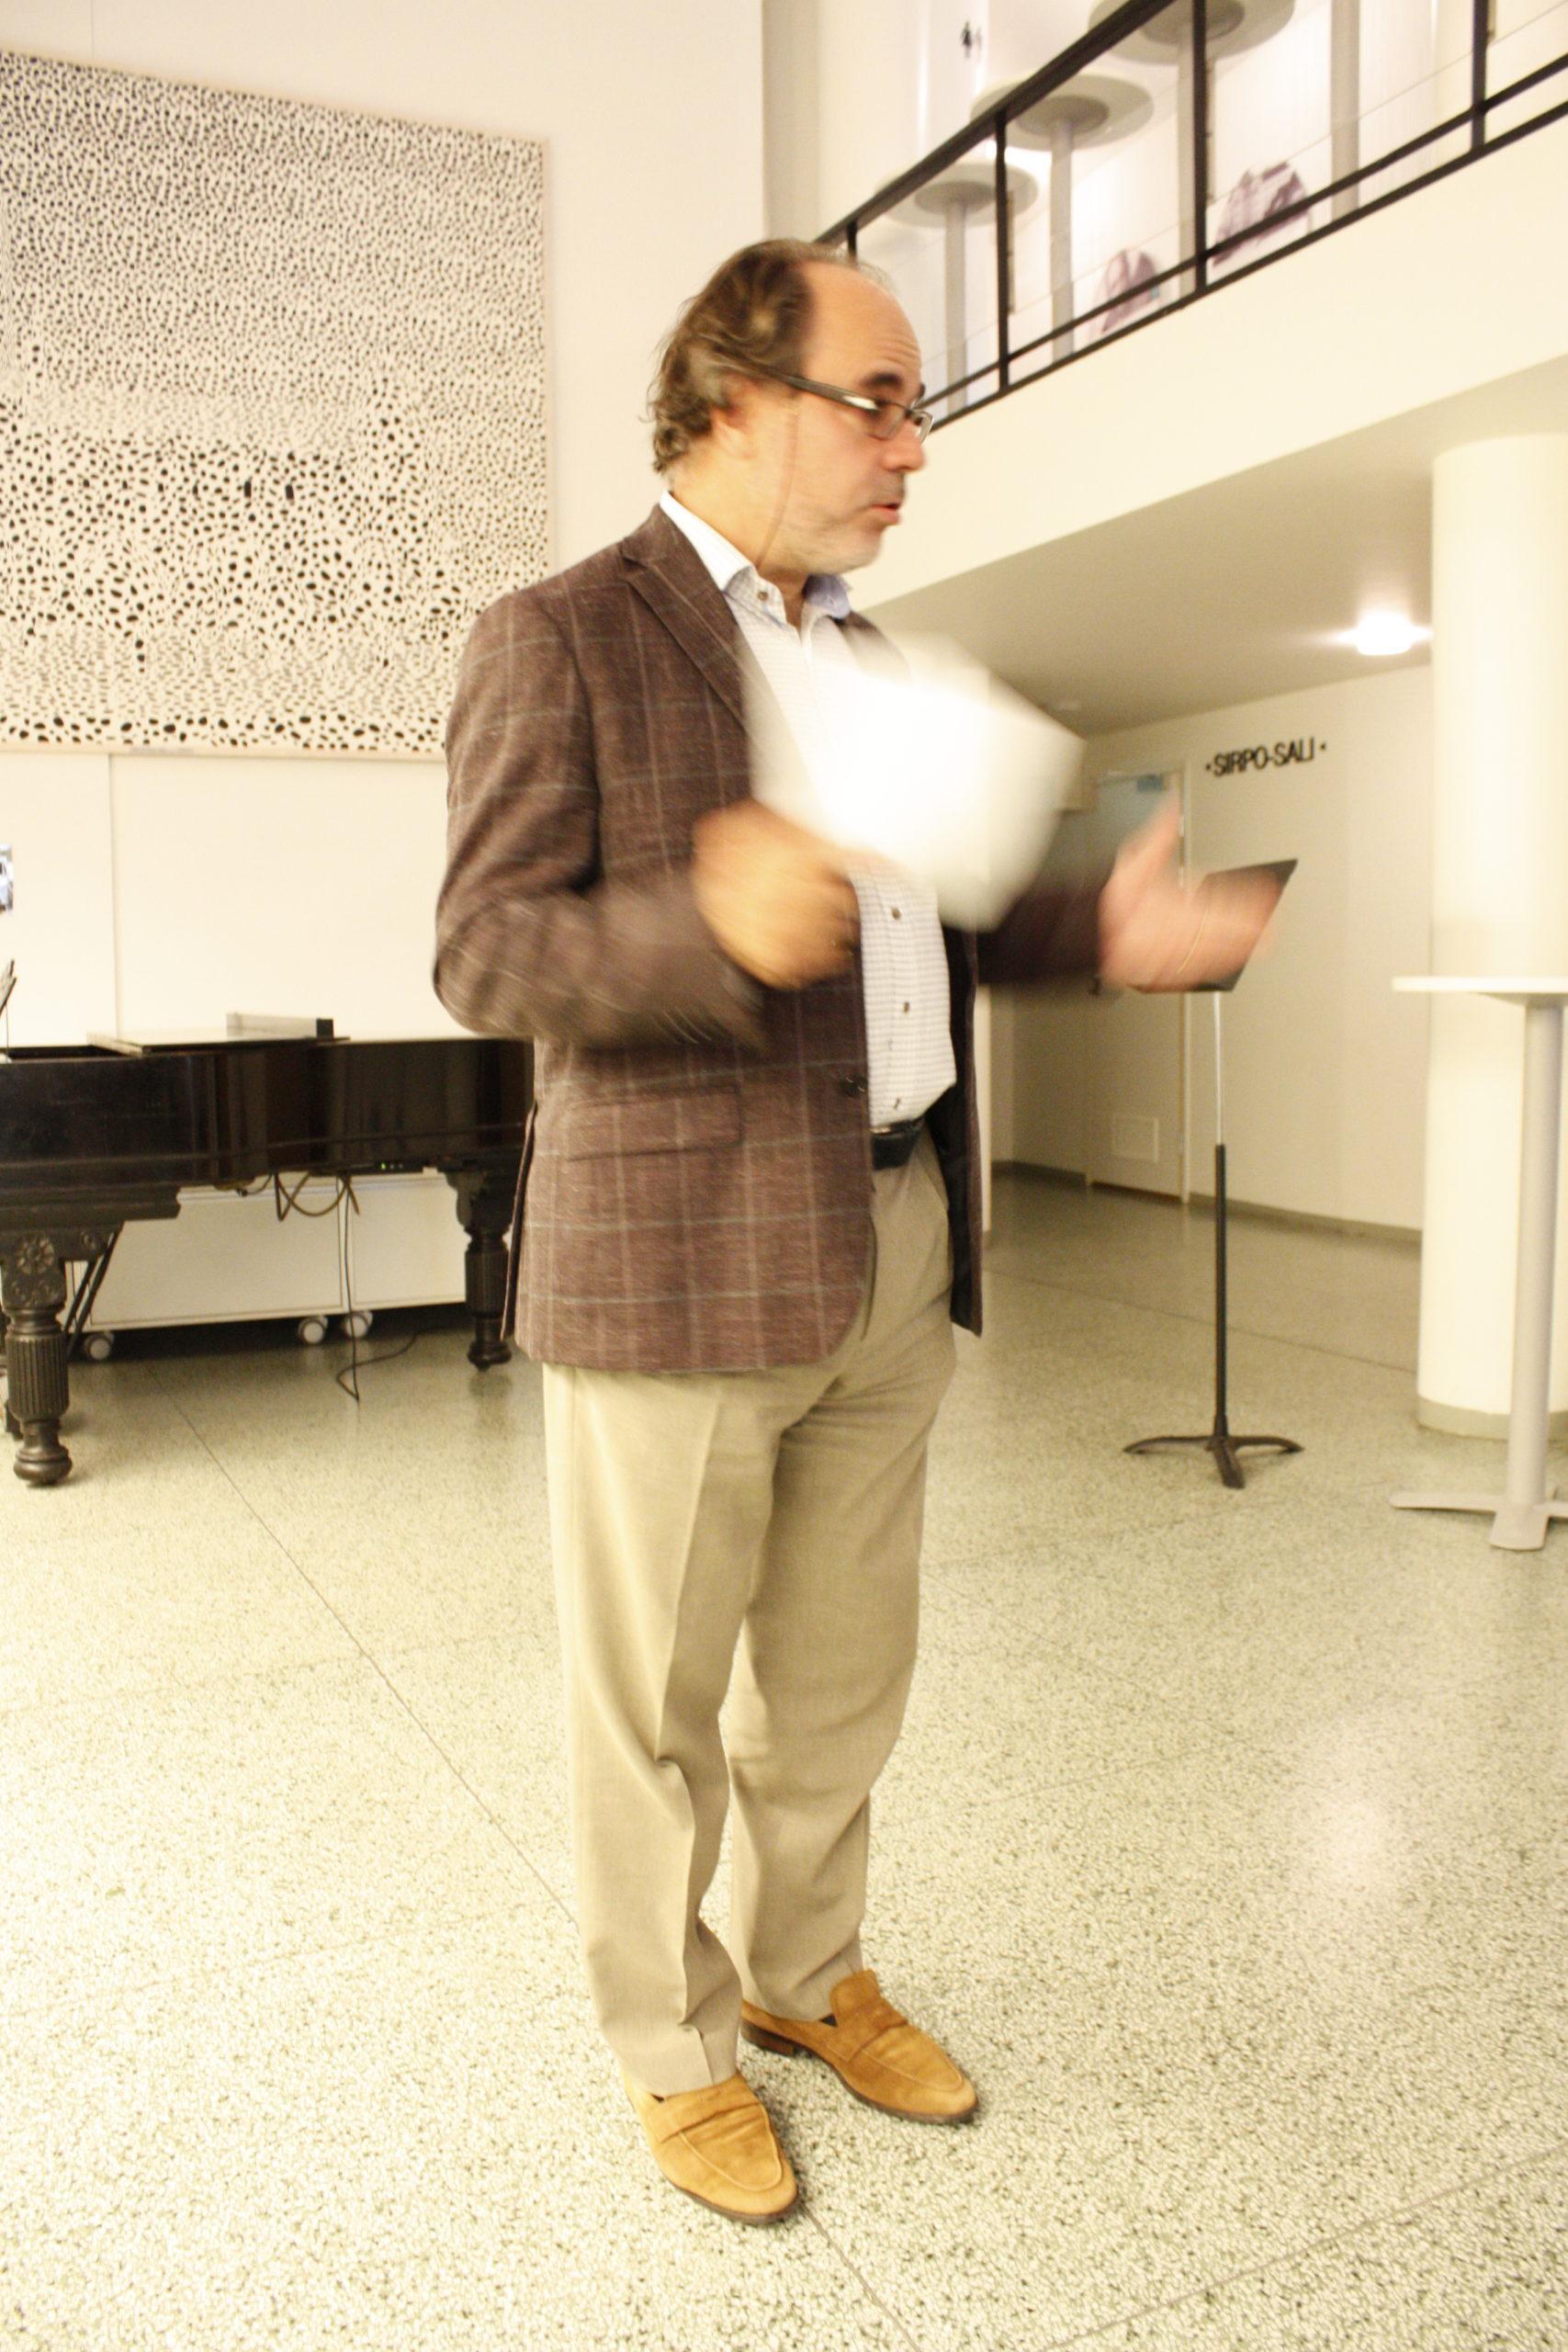 Konsertin juontaja Peter Lönnqvist